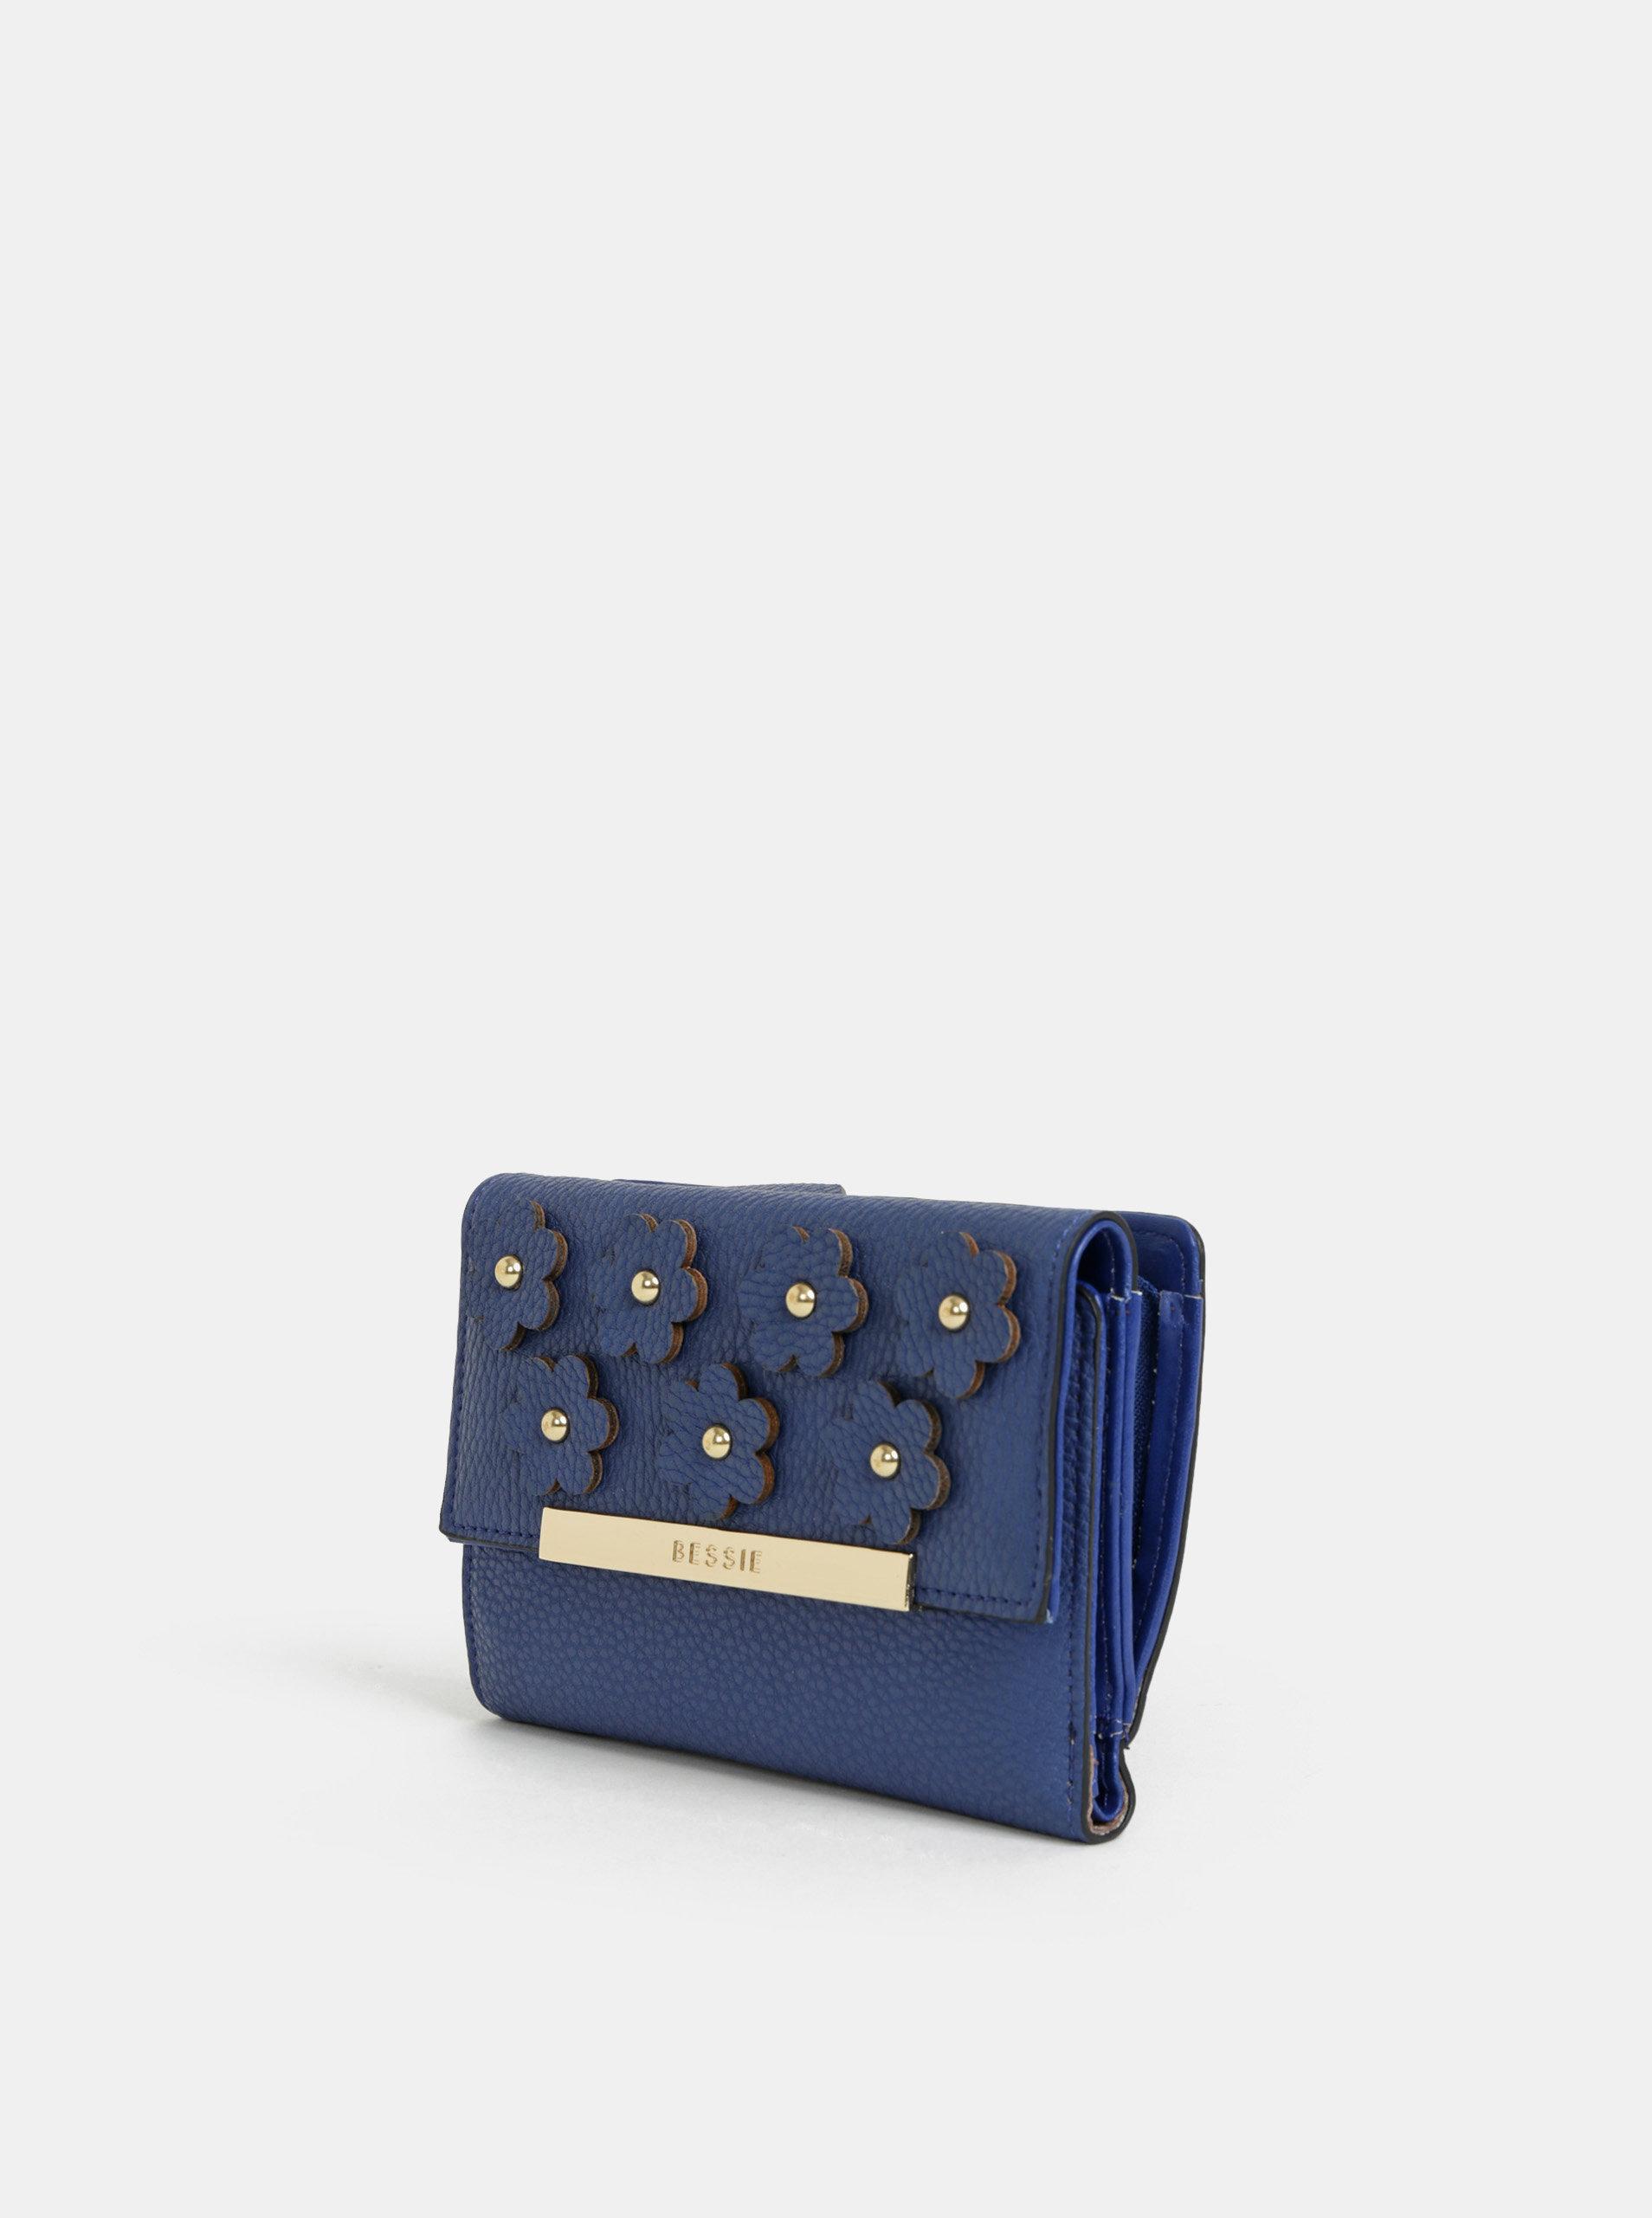 306c169253 Modrá peňaženka s ozdobnými detailmi Bessie London ...